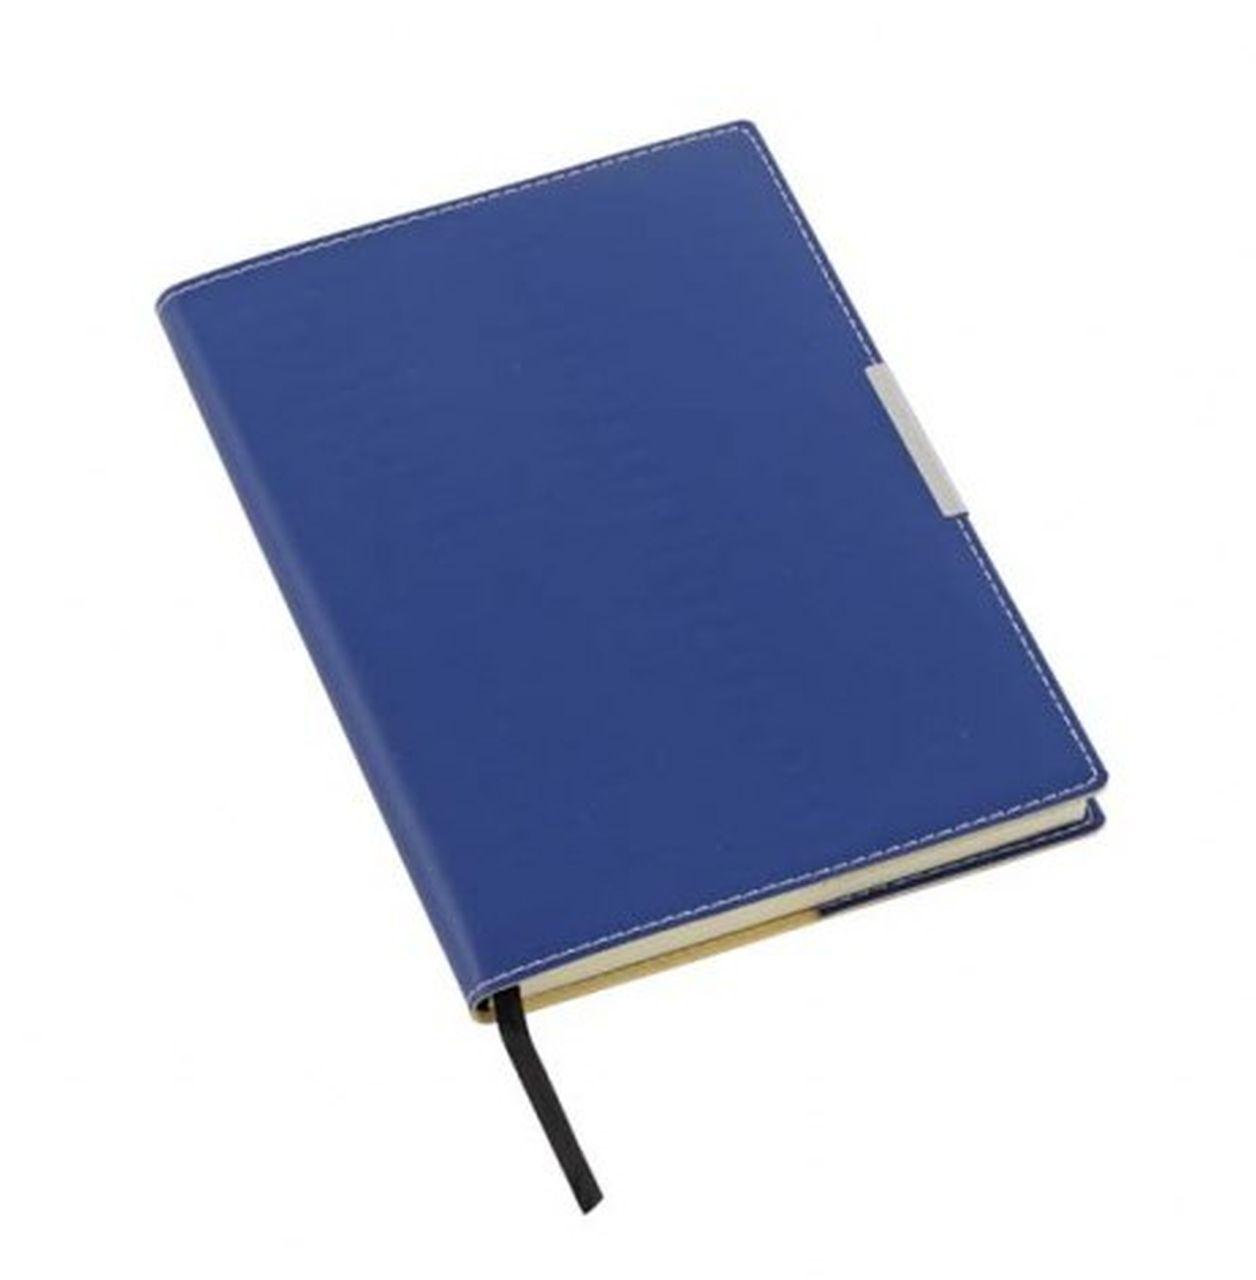 Notebook blu placca argento